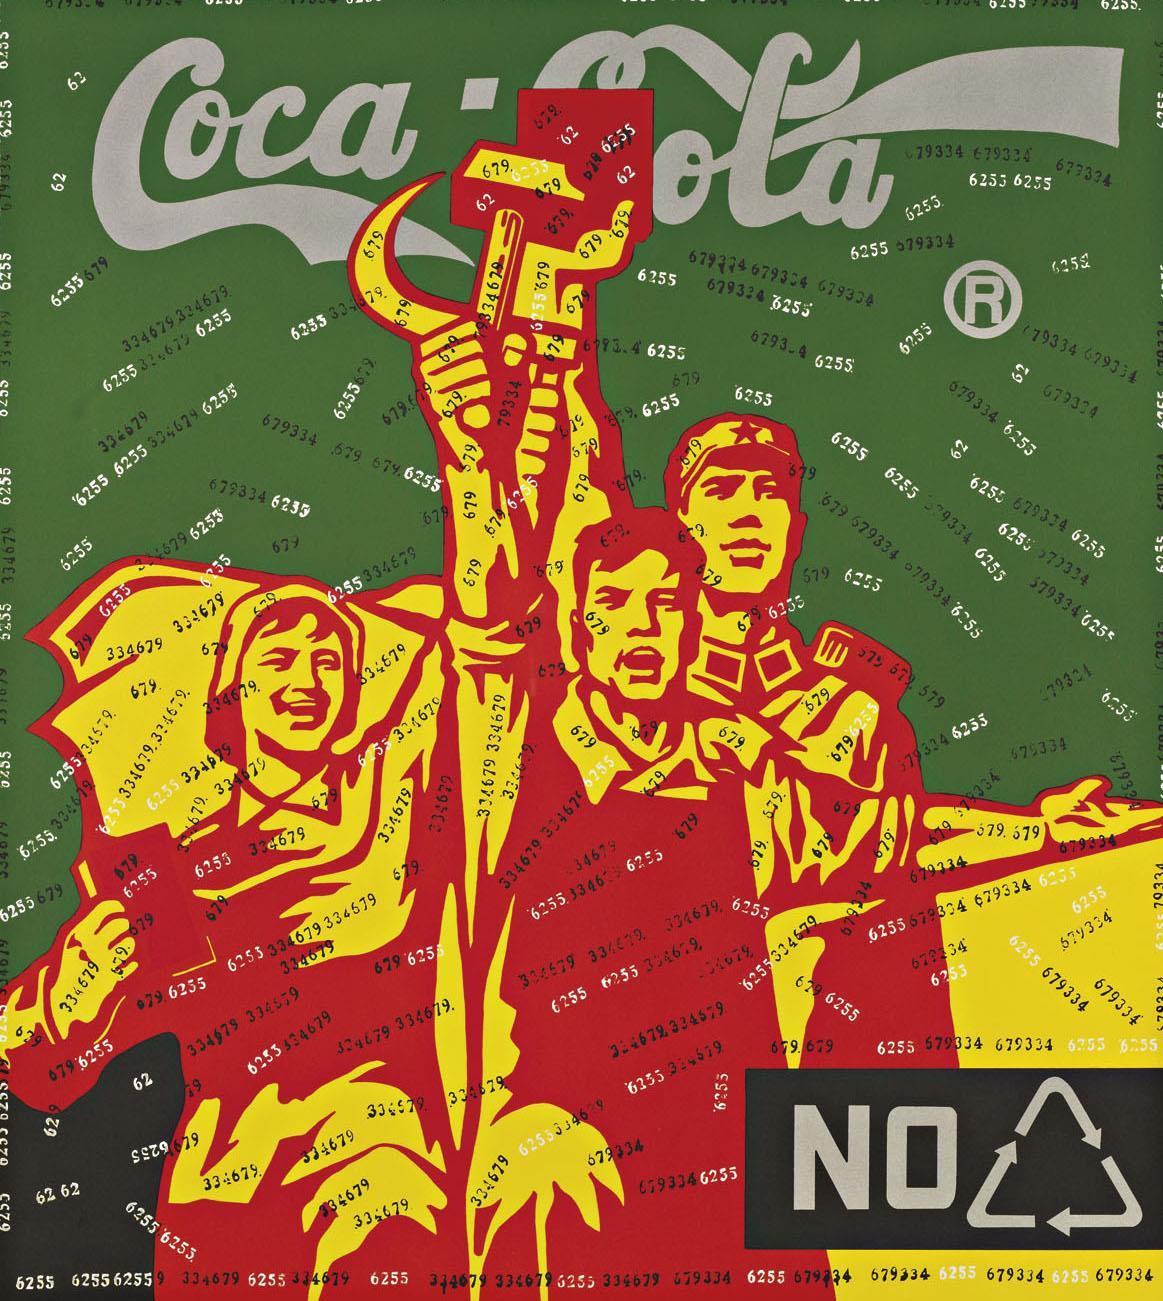 Great Criticism - Coca Cola